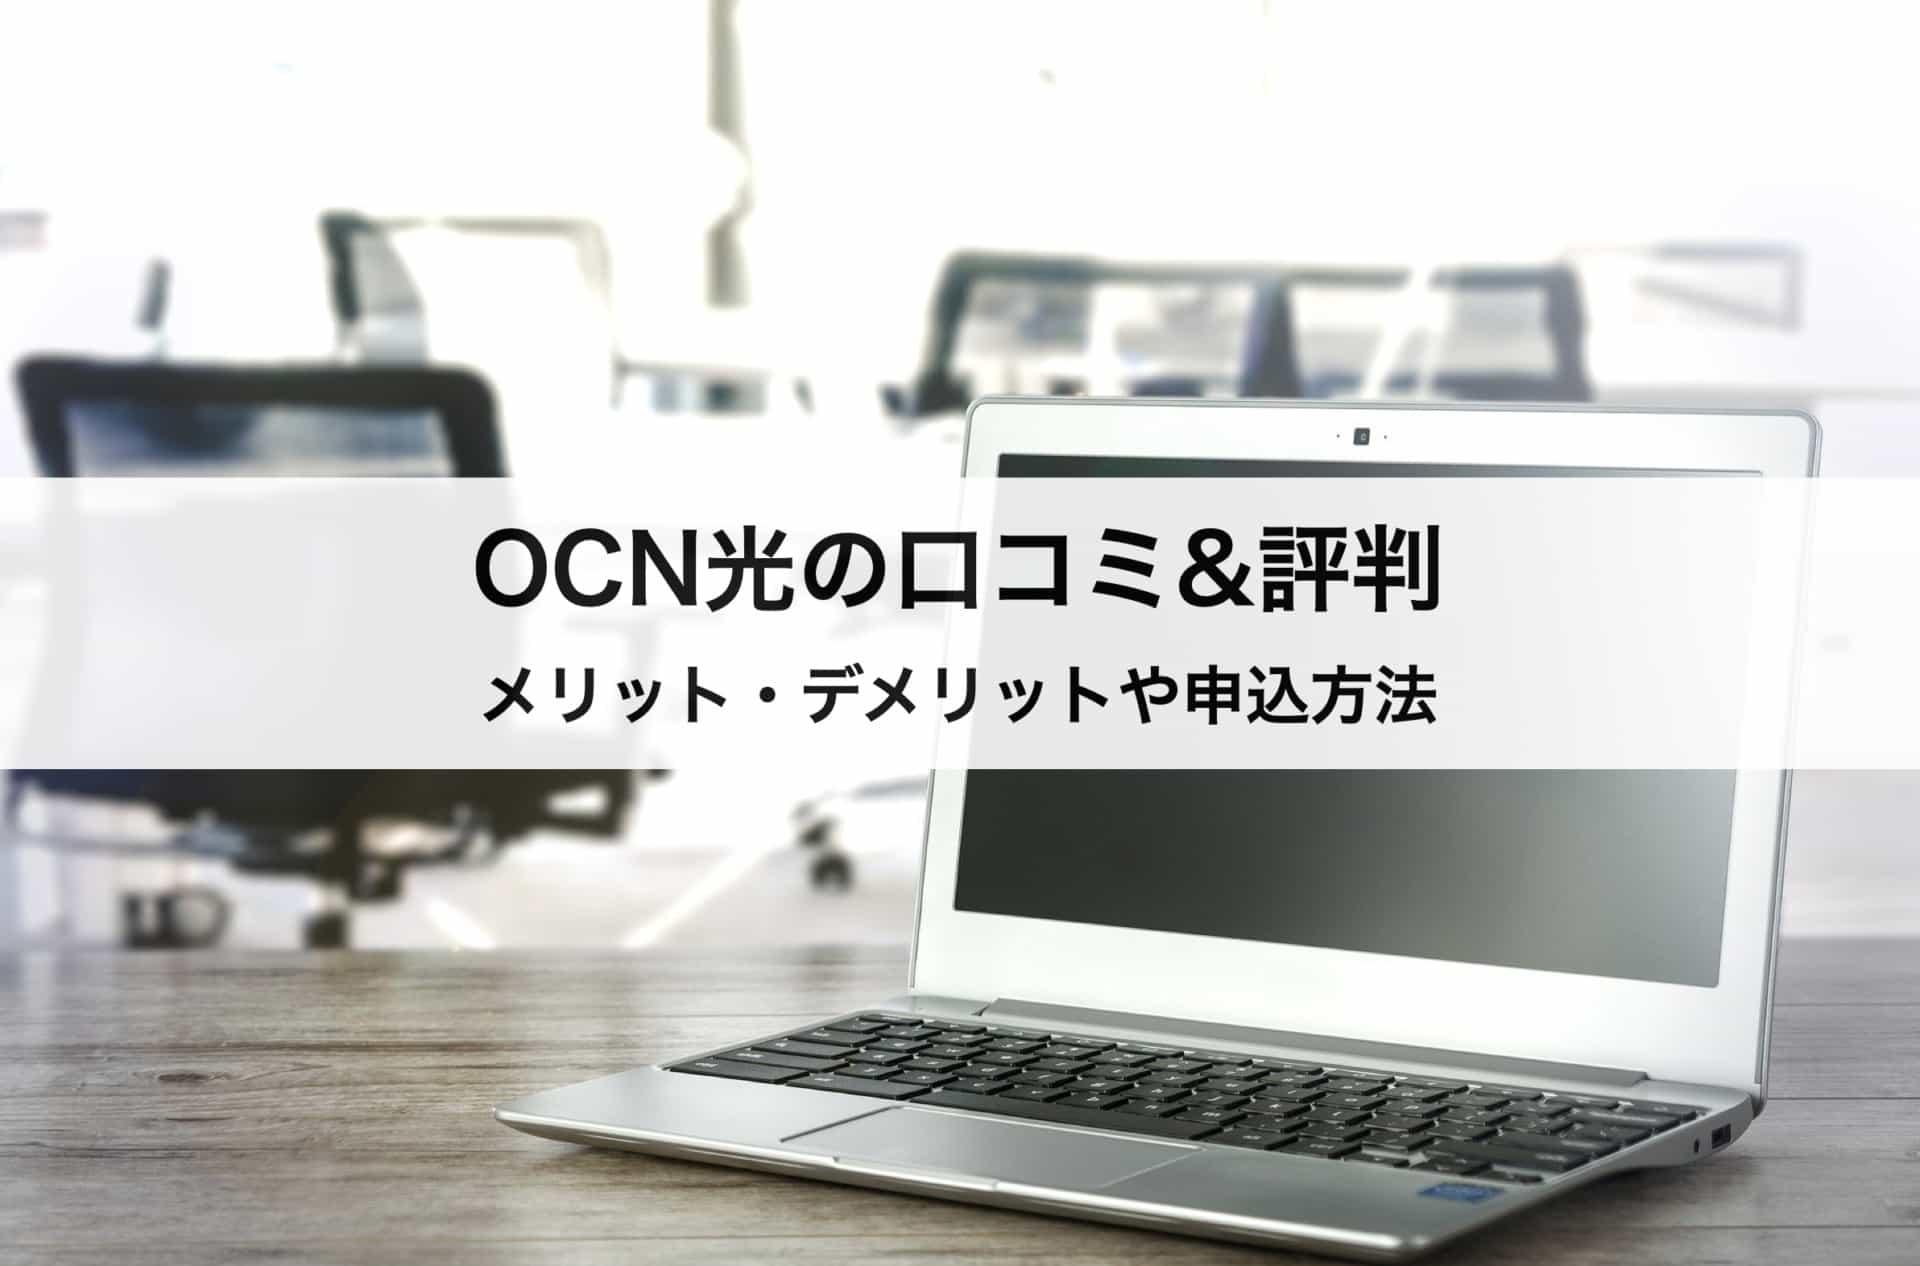 OCN光の口コミ&評判|メリット・デメリットや申込方法まで徹底解説!